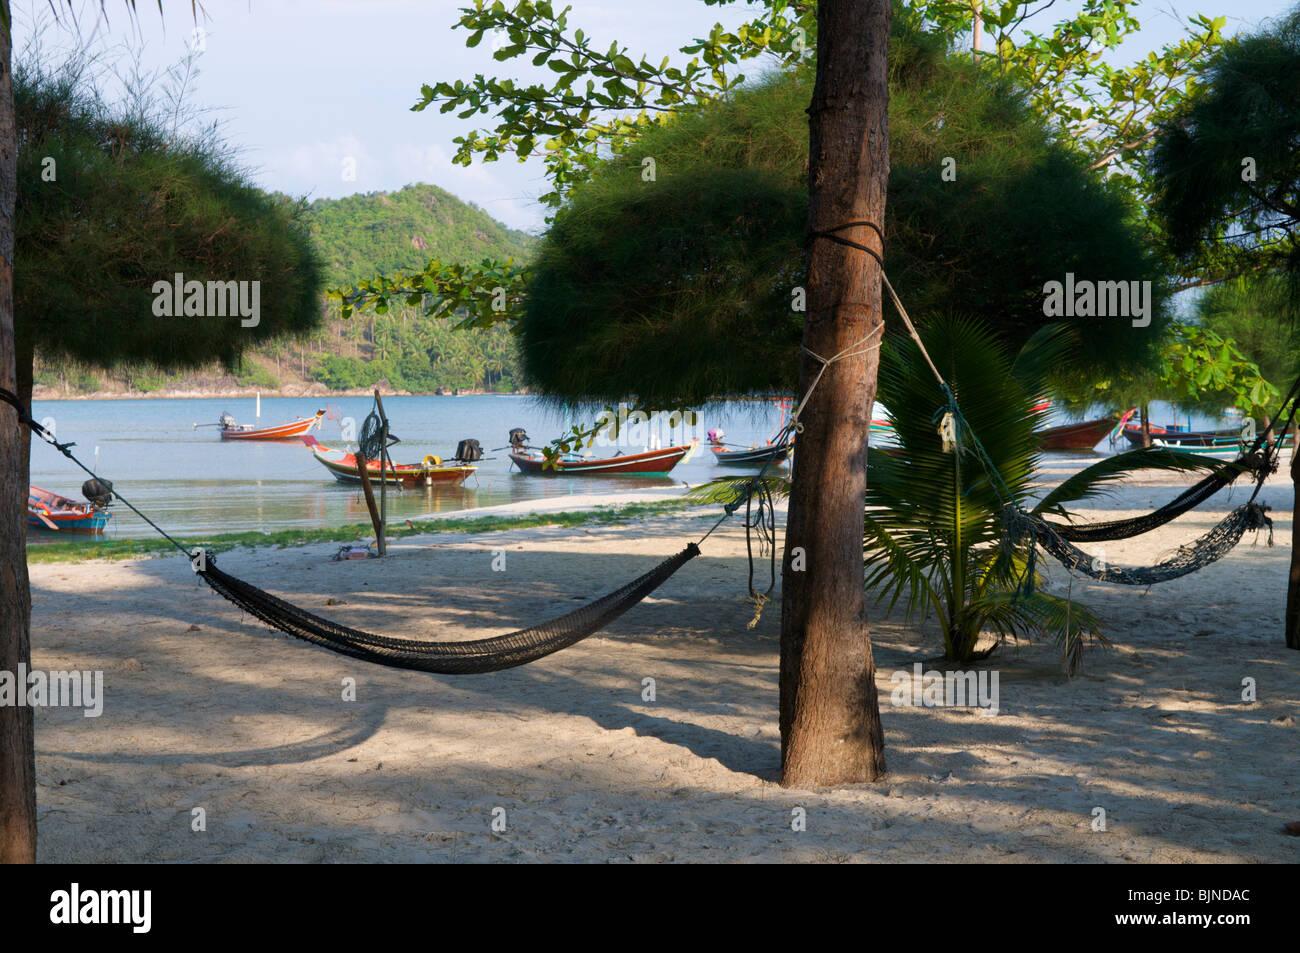 Hammocks on the beach - Hammocks On The Beach In Chaloklum Koh Phangan Thailand